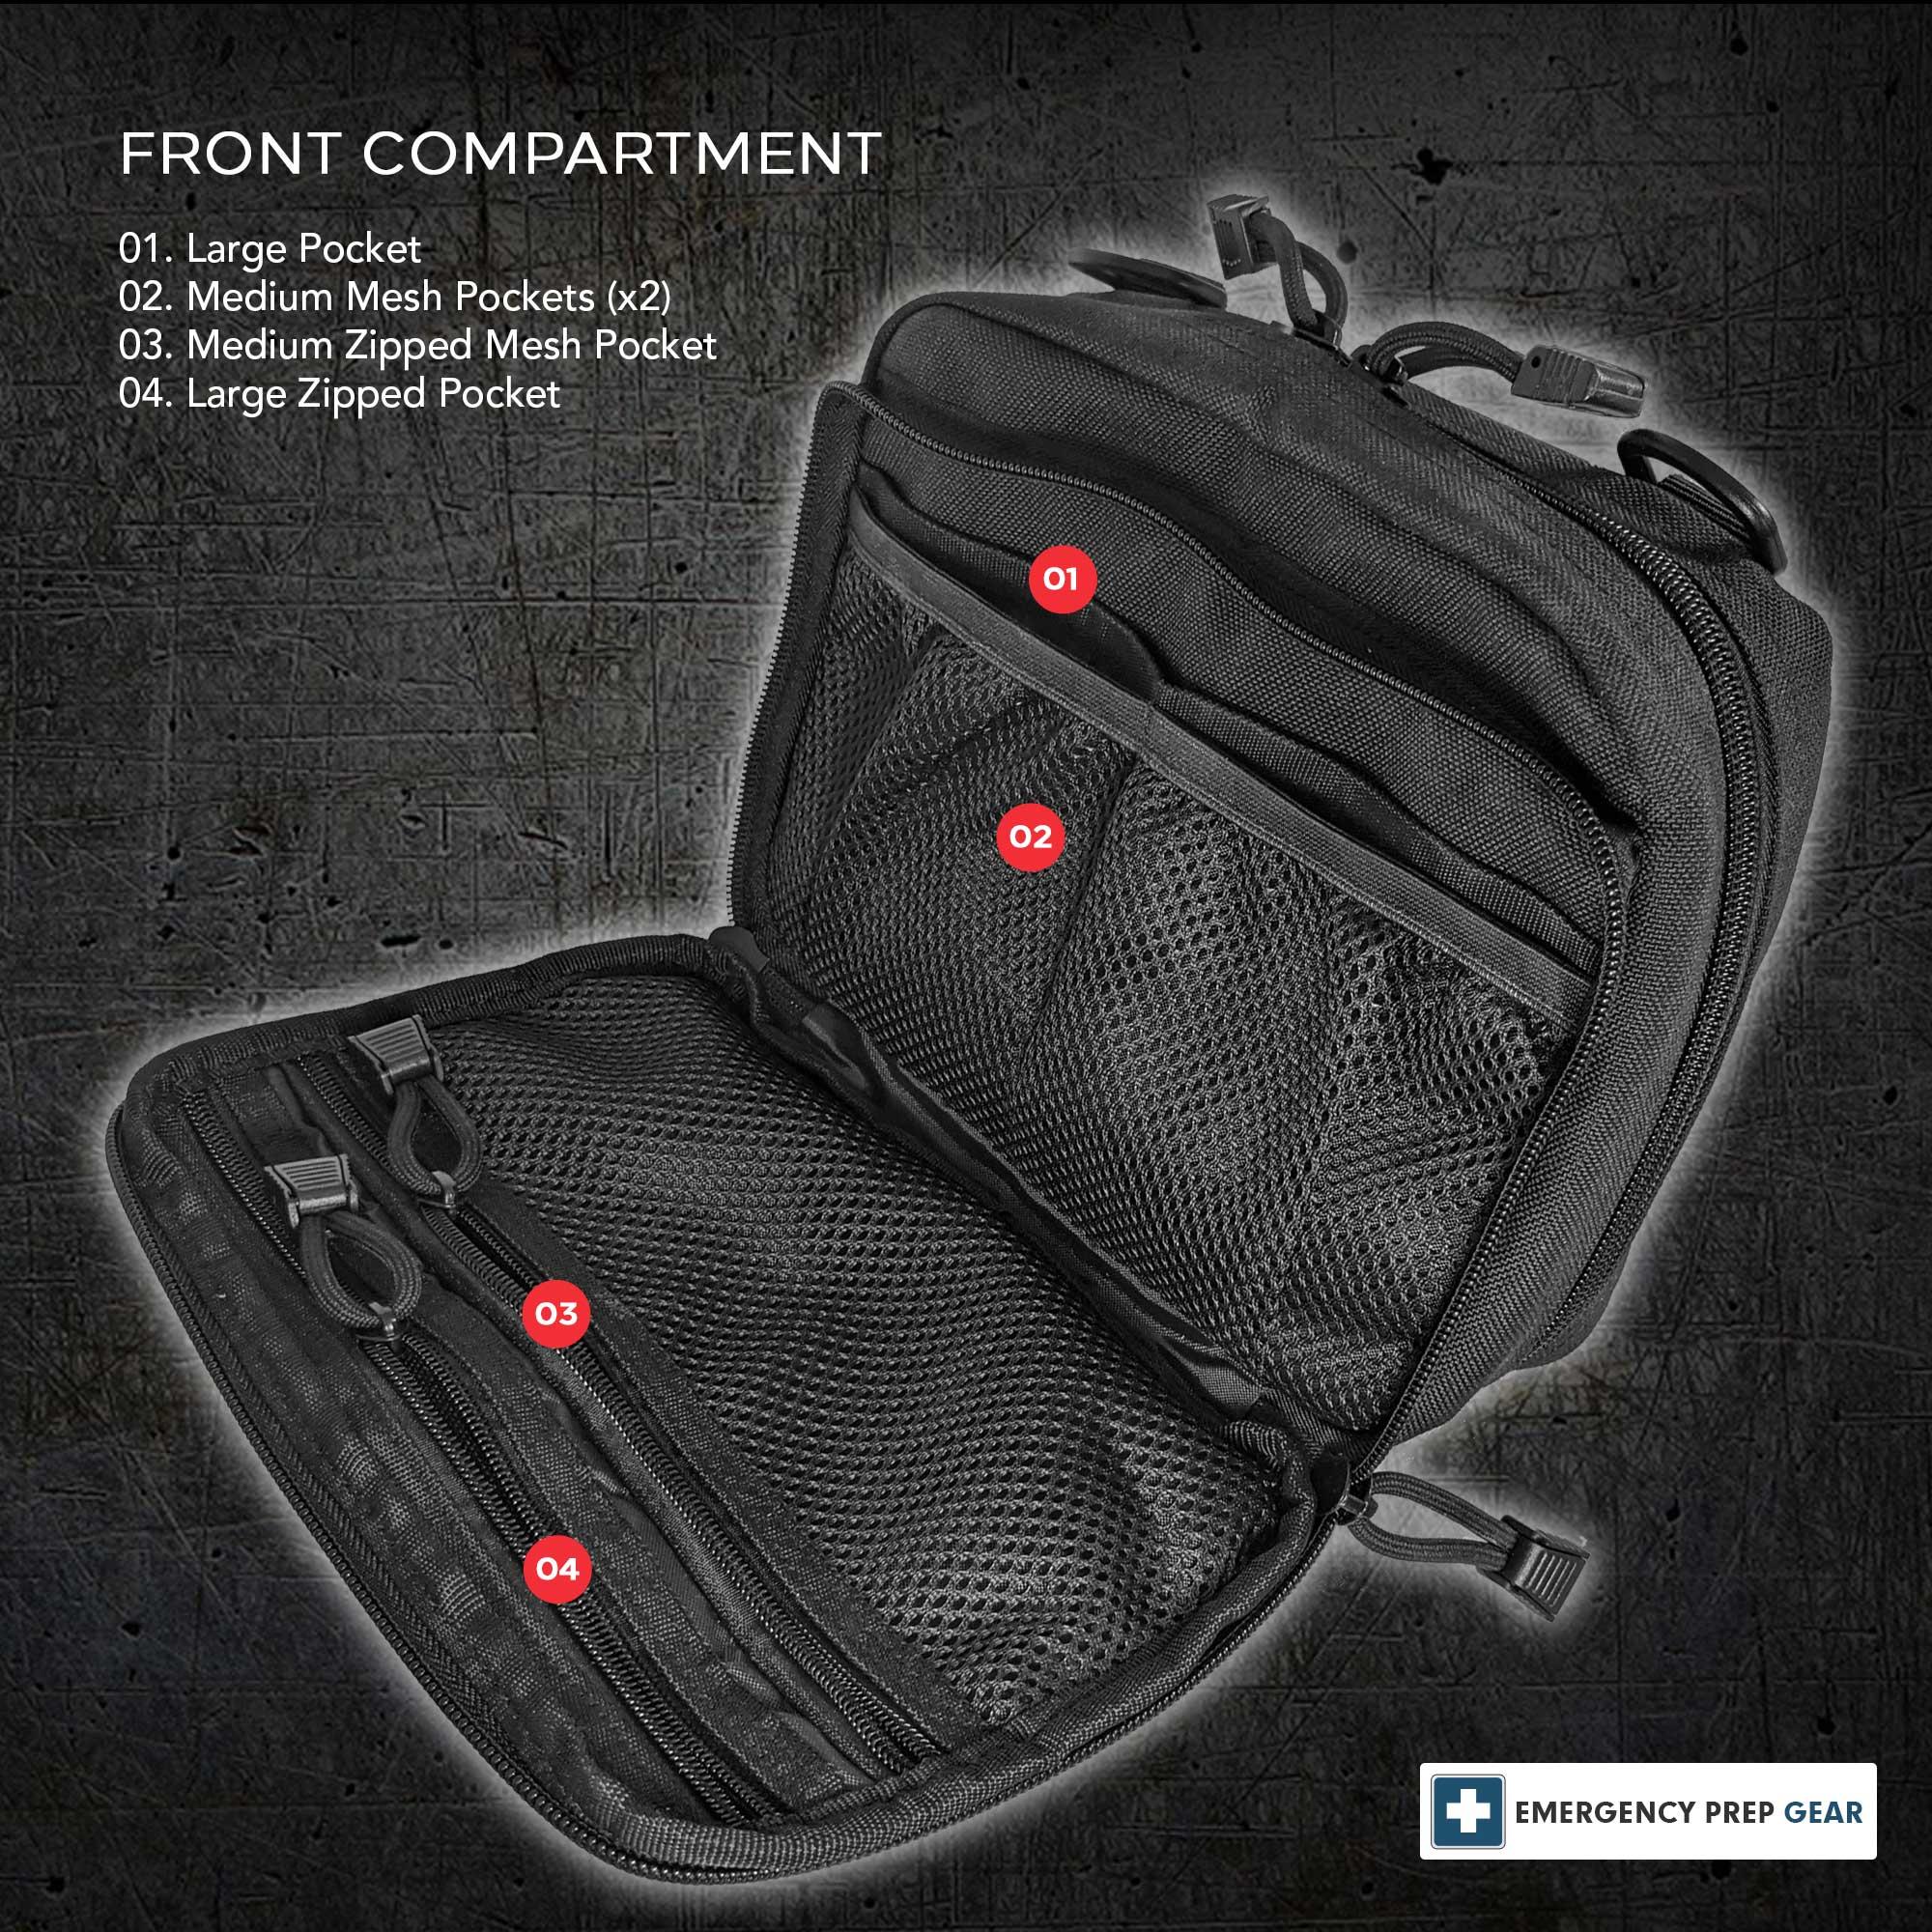 21 10 01 14 38 32 original b09dqz9vnl epg gear black compartment2